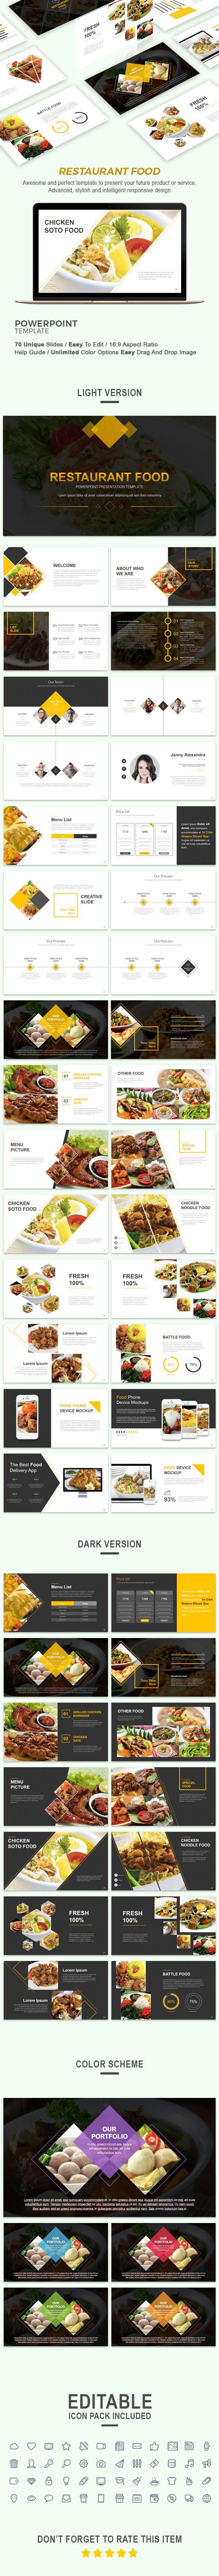 Restaurant Food PowerPoint Presentation Template - 70+ Unique Slides